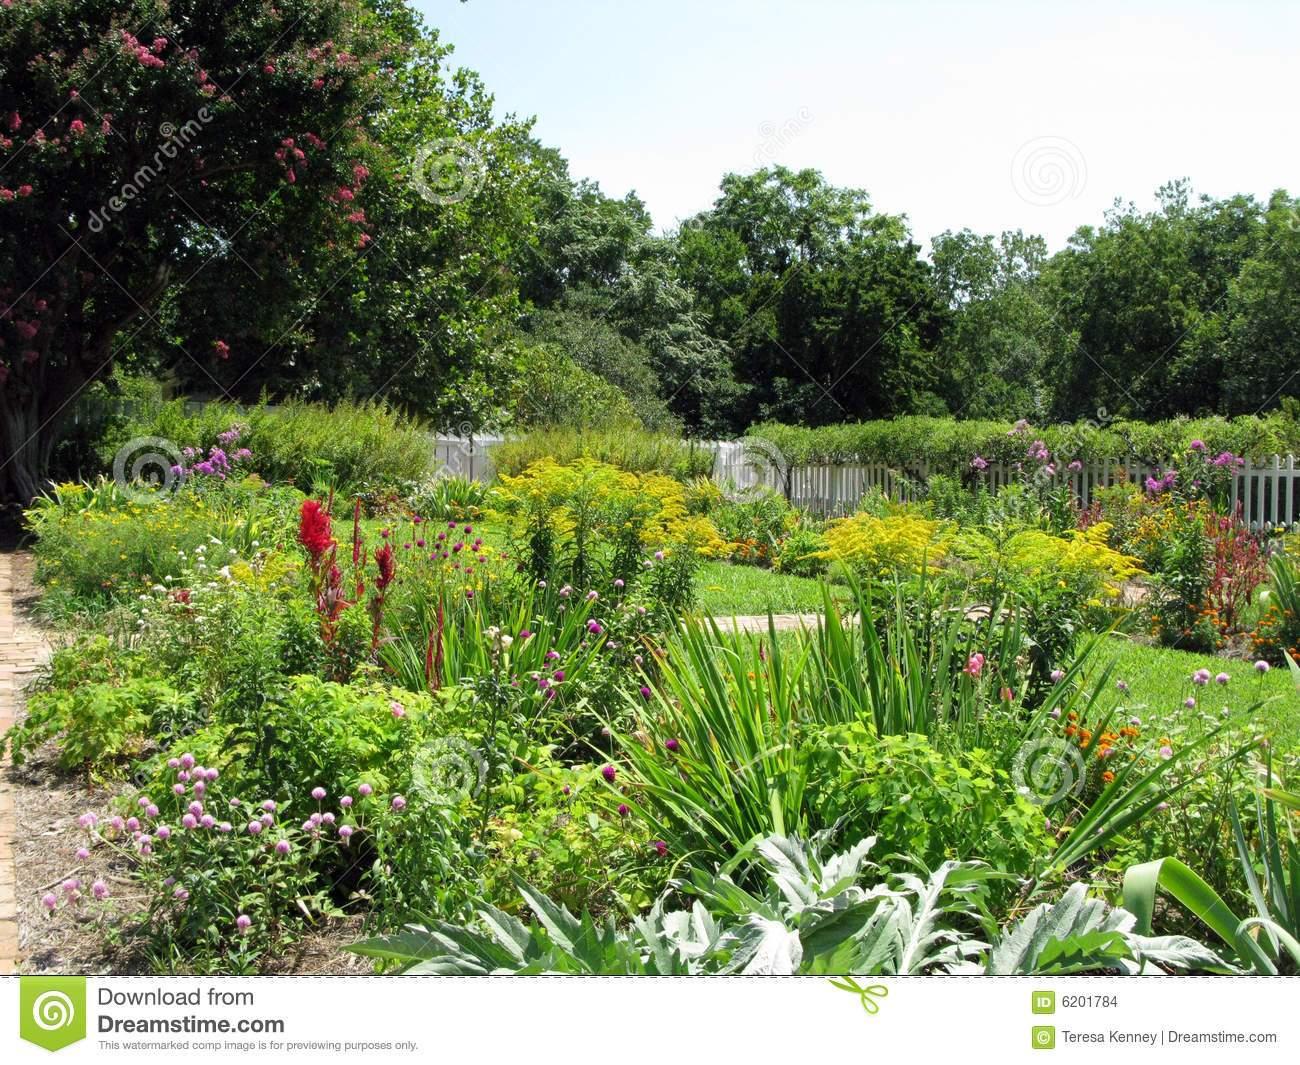 stockbilder schöne gärten image